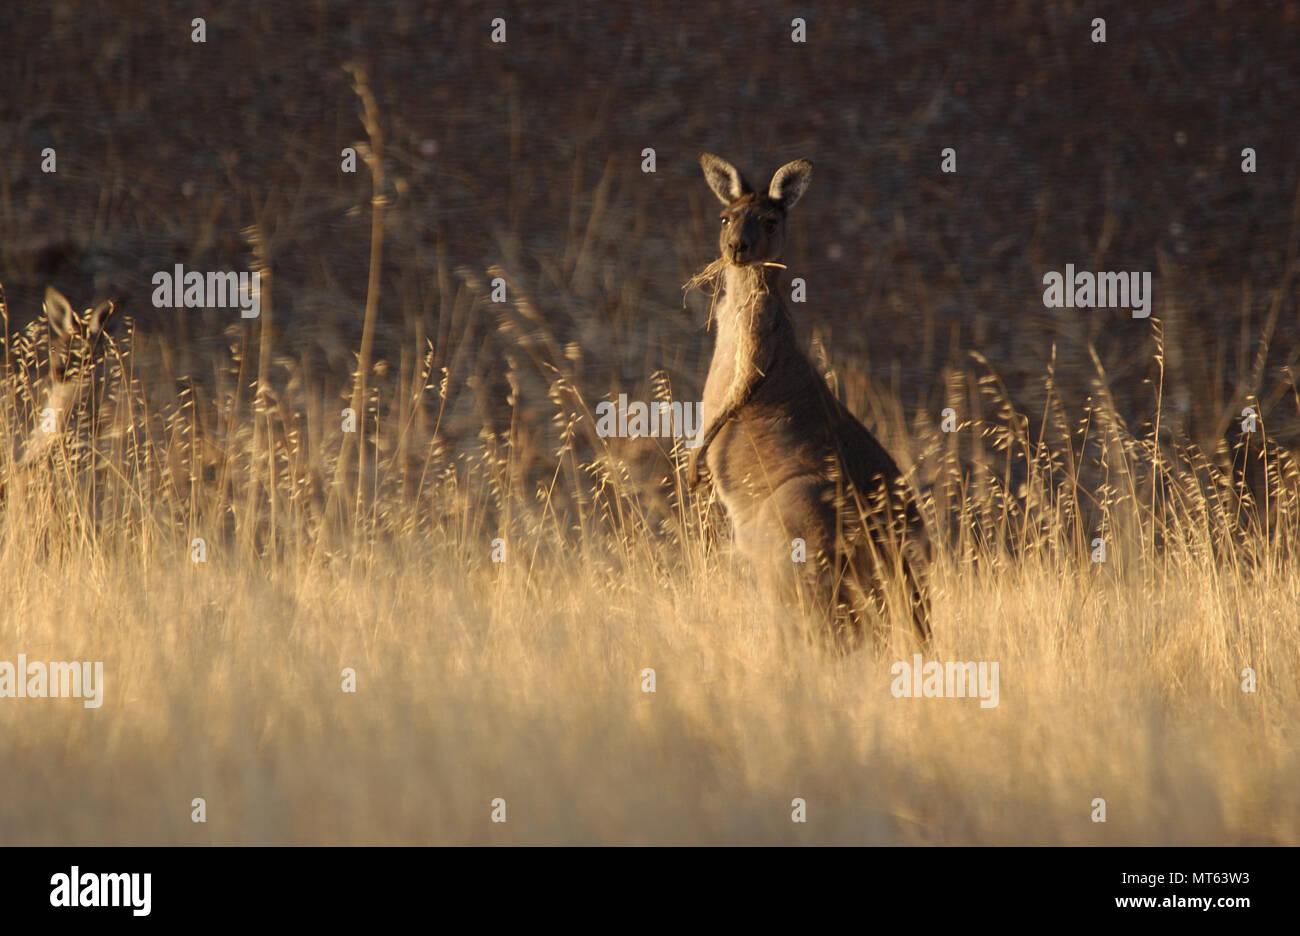 A Western Grey kangaroo, outback Western Australia. - Stock Image